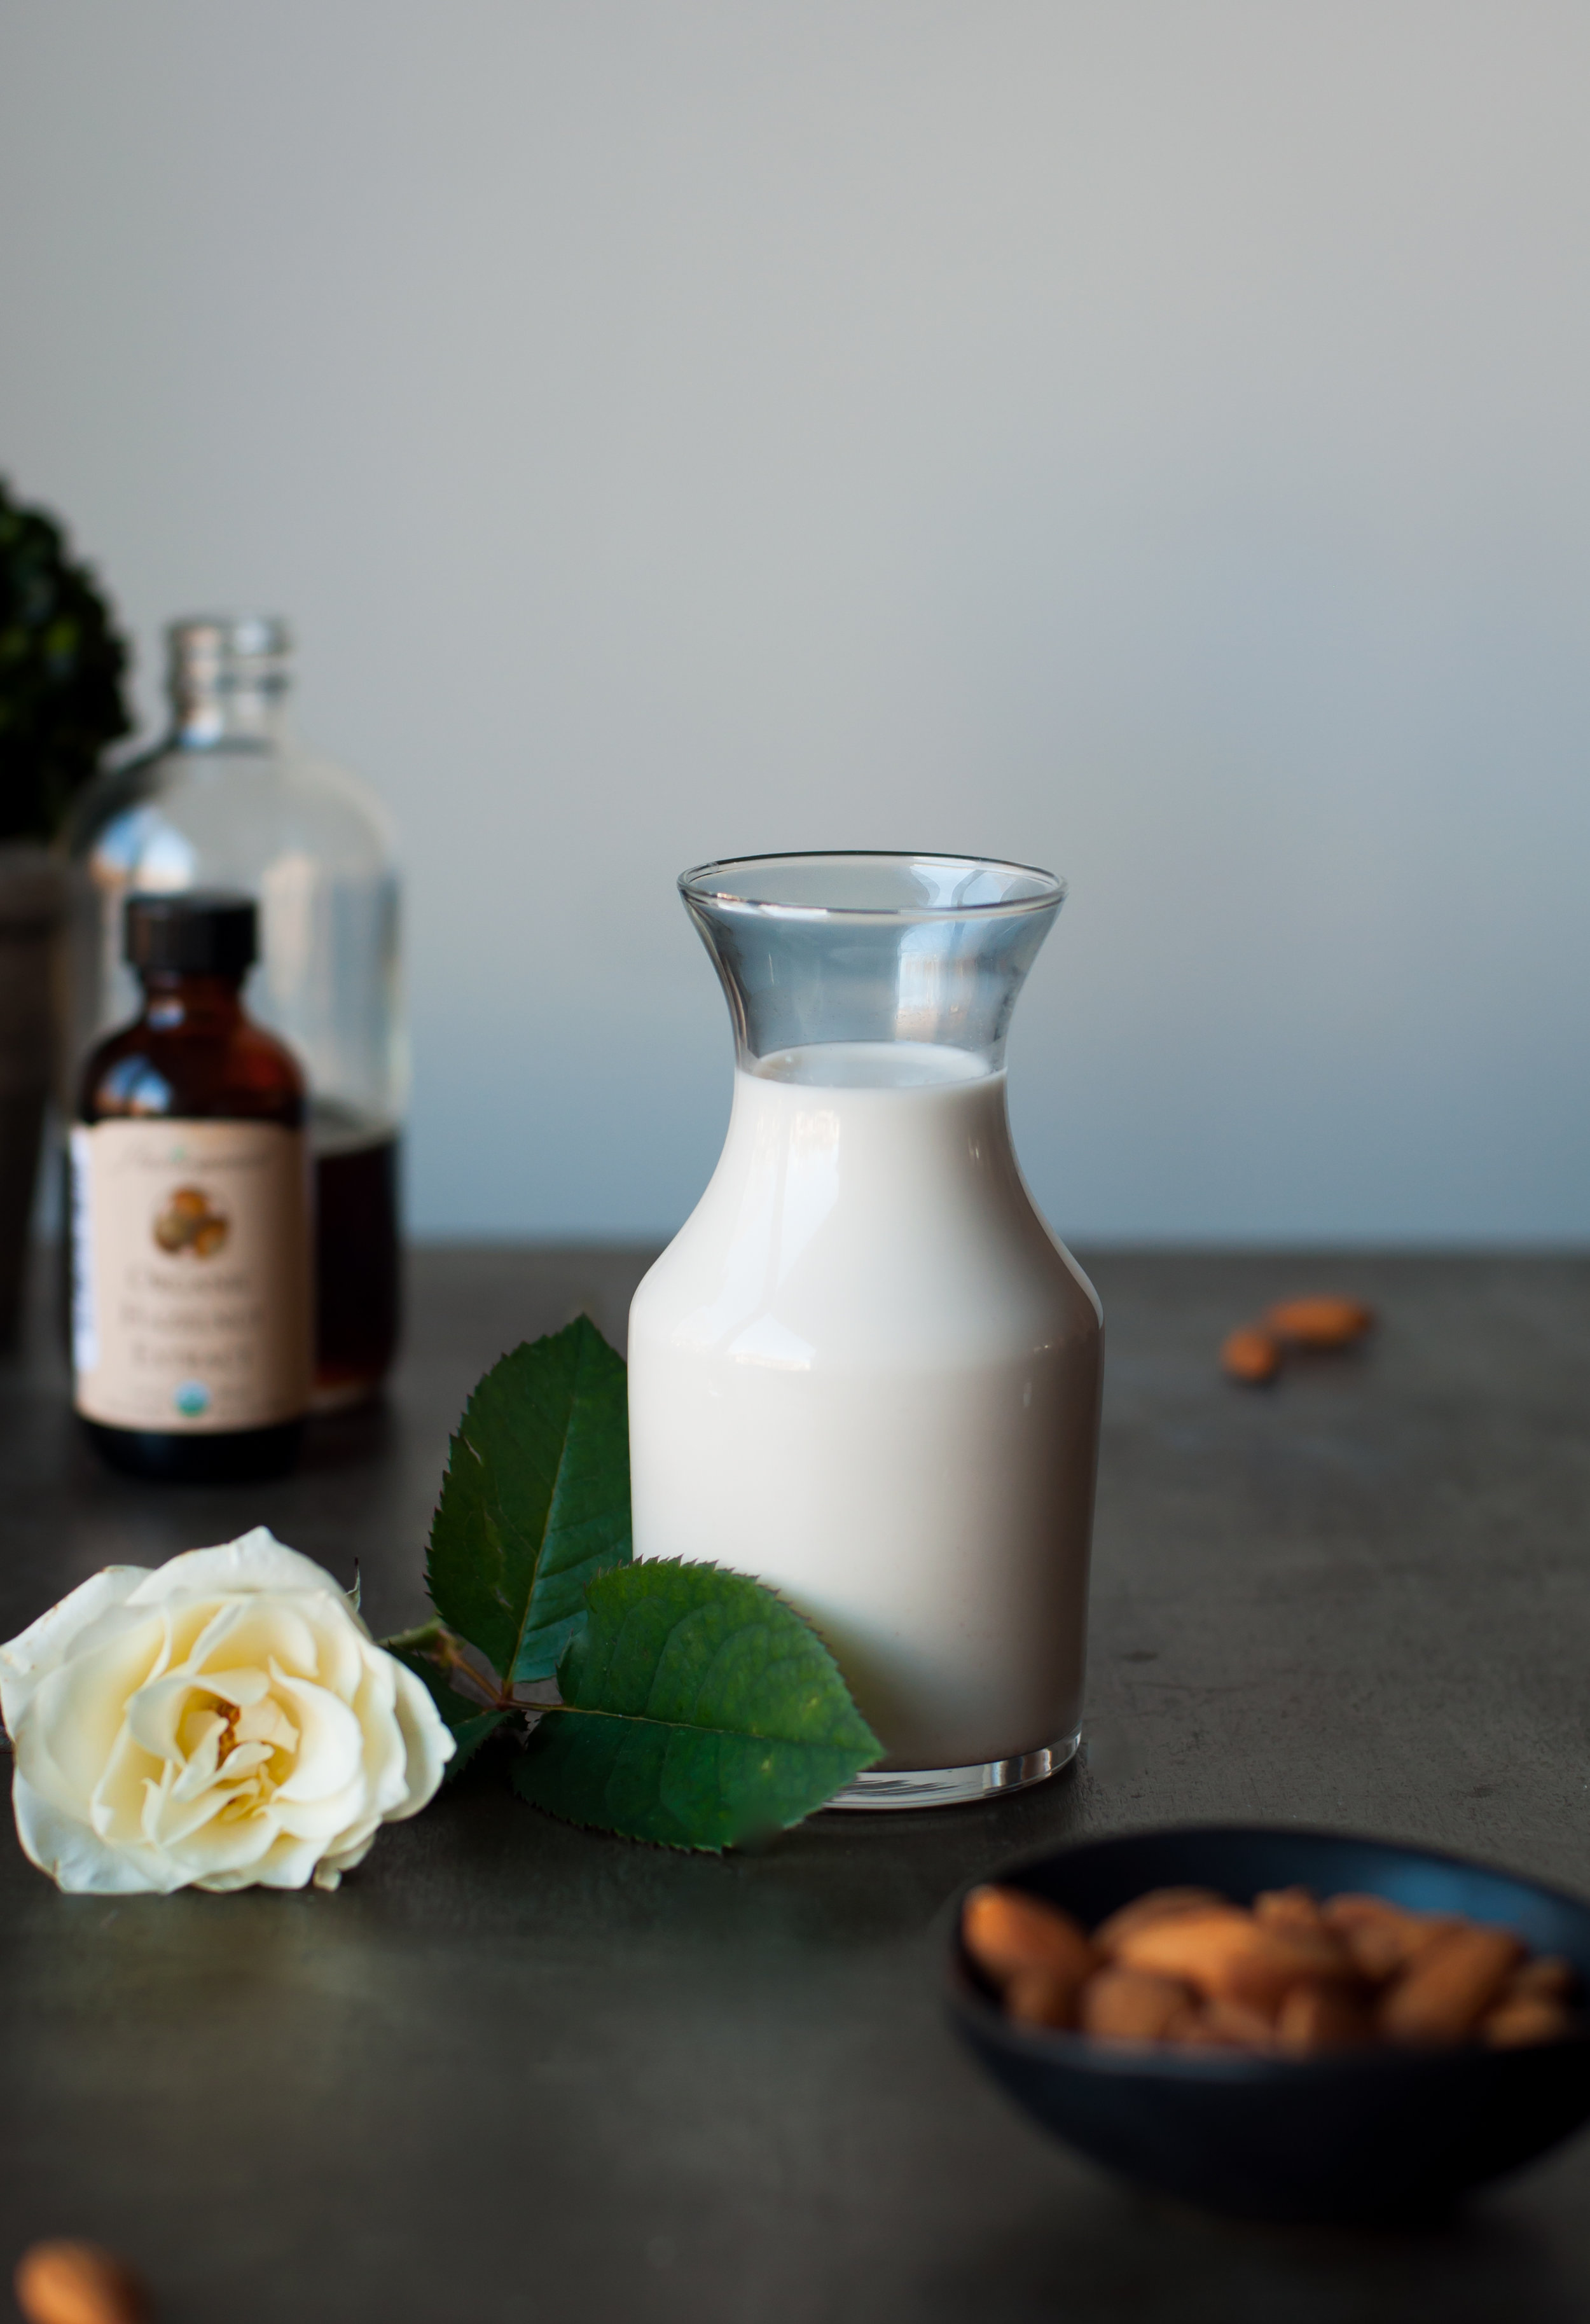 hazelnut coffee creamer-0129.jpg